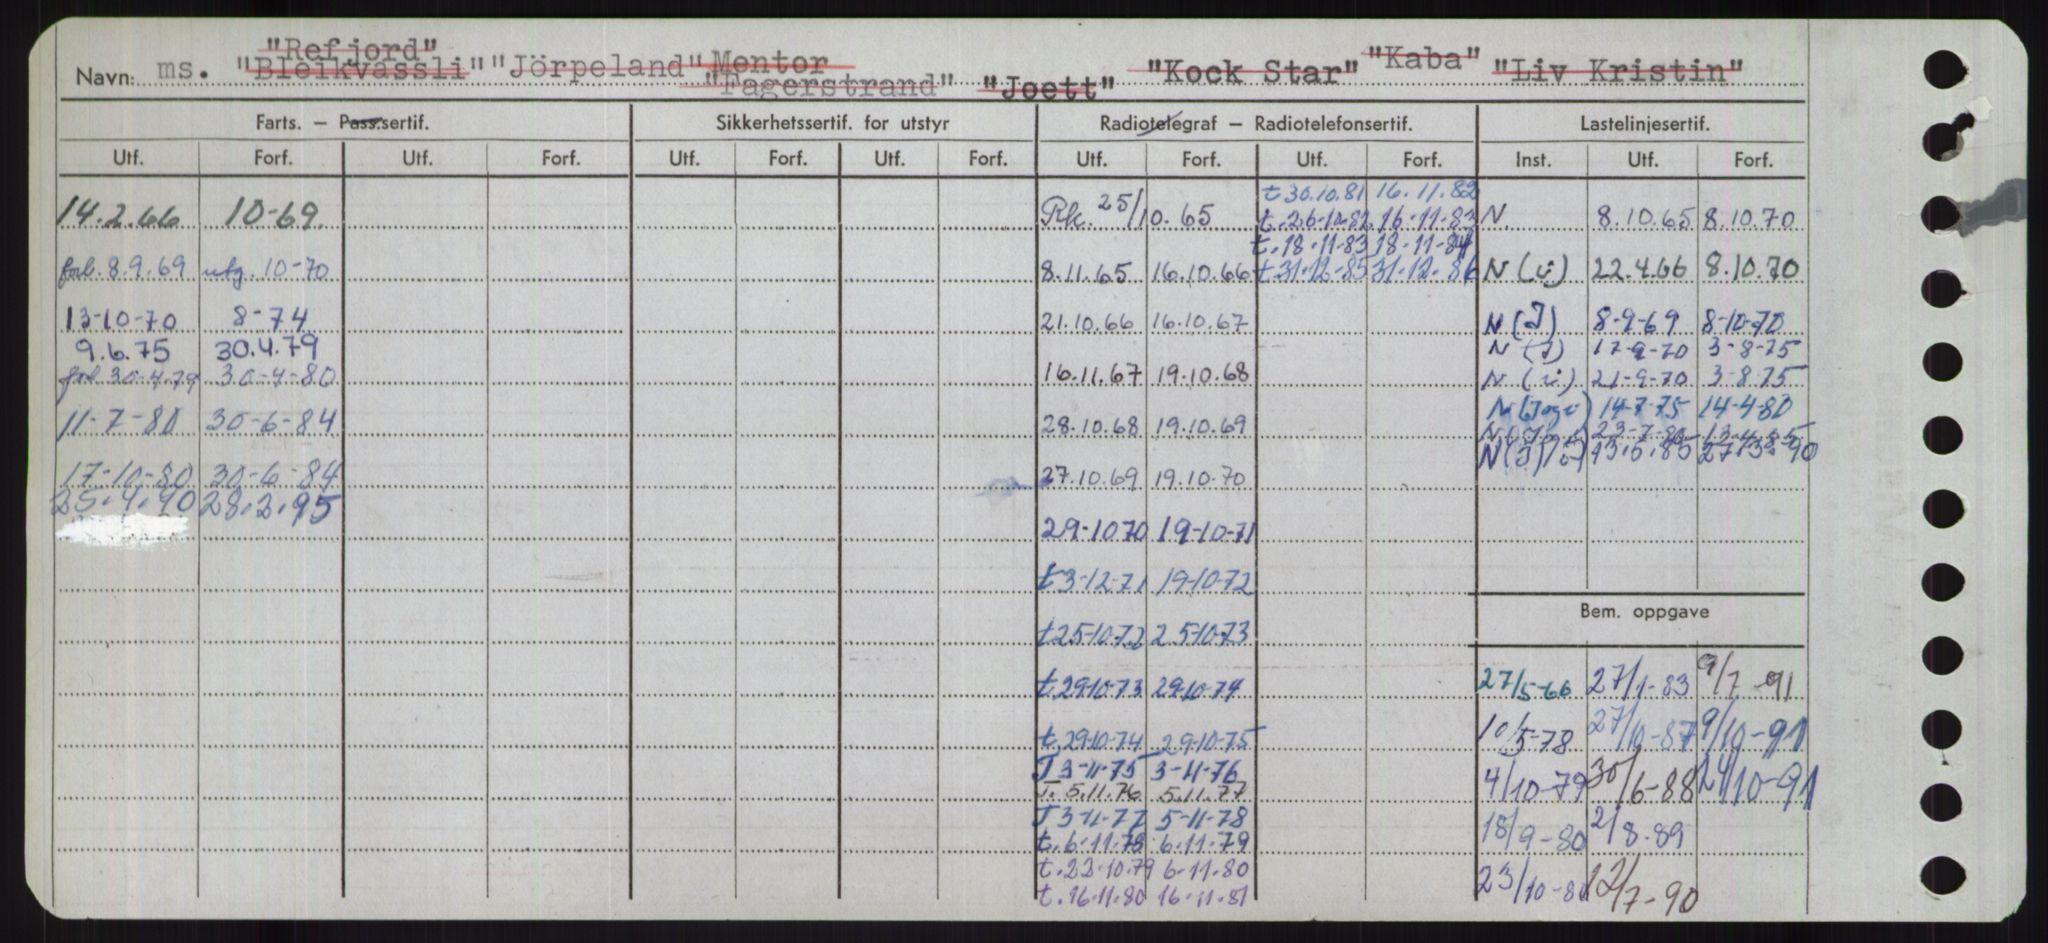 RA, Sjøfartsdirektoratet med forløpere, Skipsmålingen, H/Ha/L0006: Fartøy, Sver-Å, s. 773